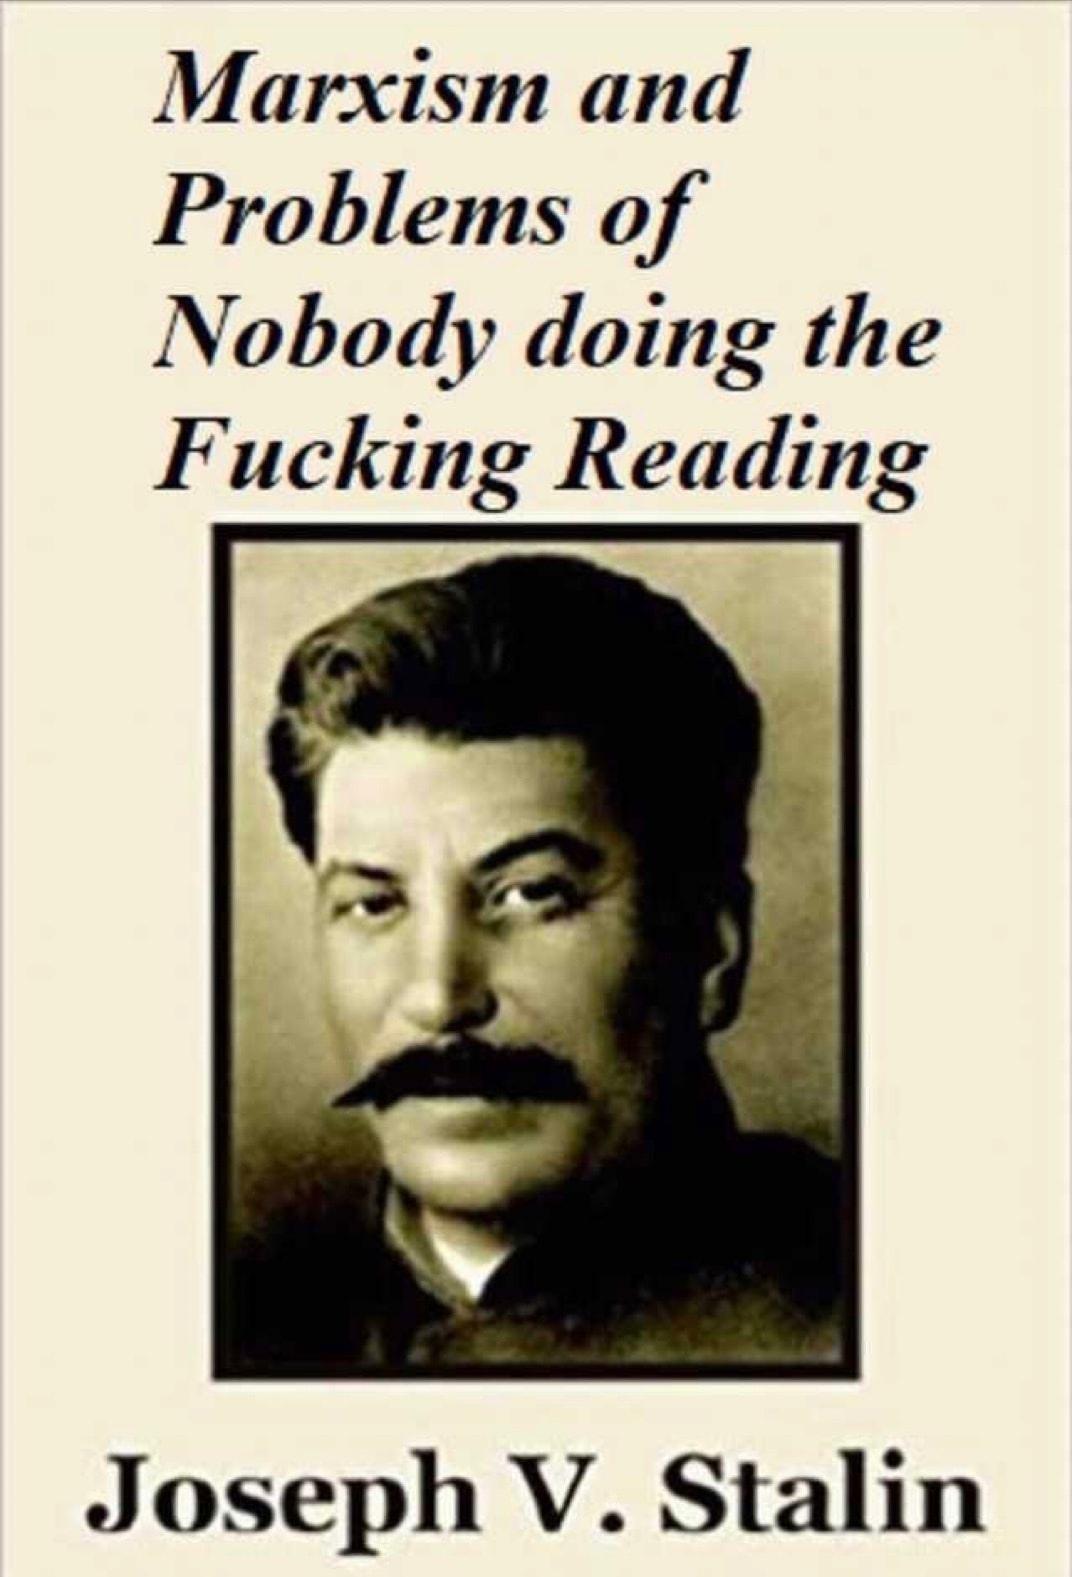 Stalin meme 2